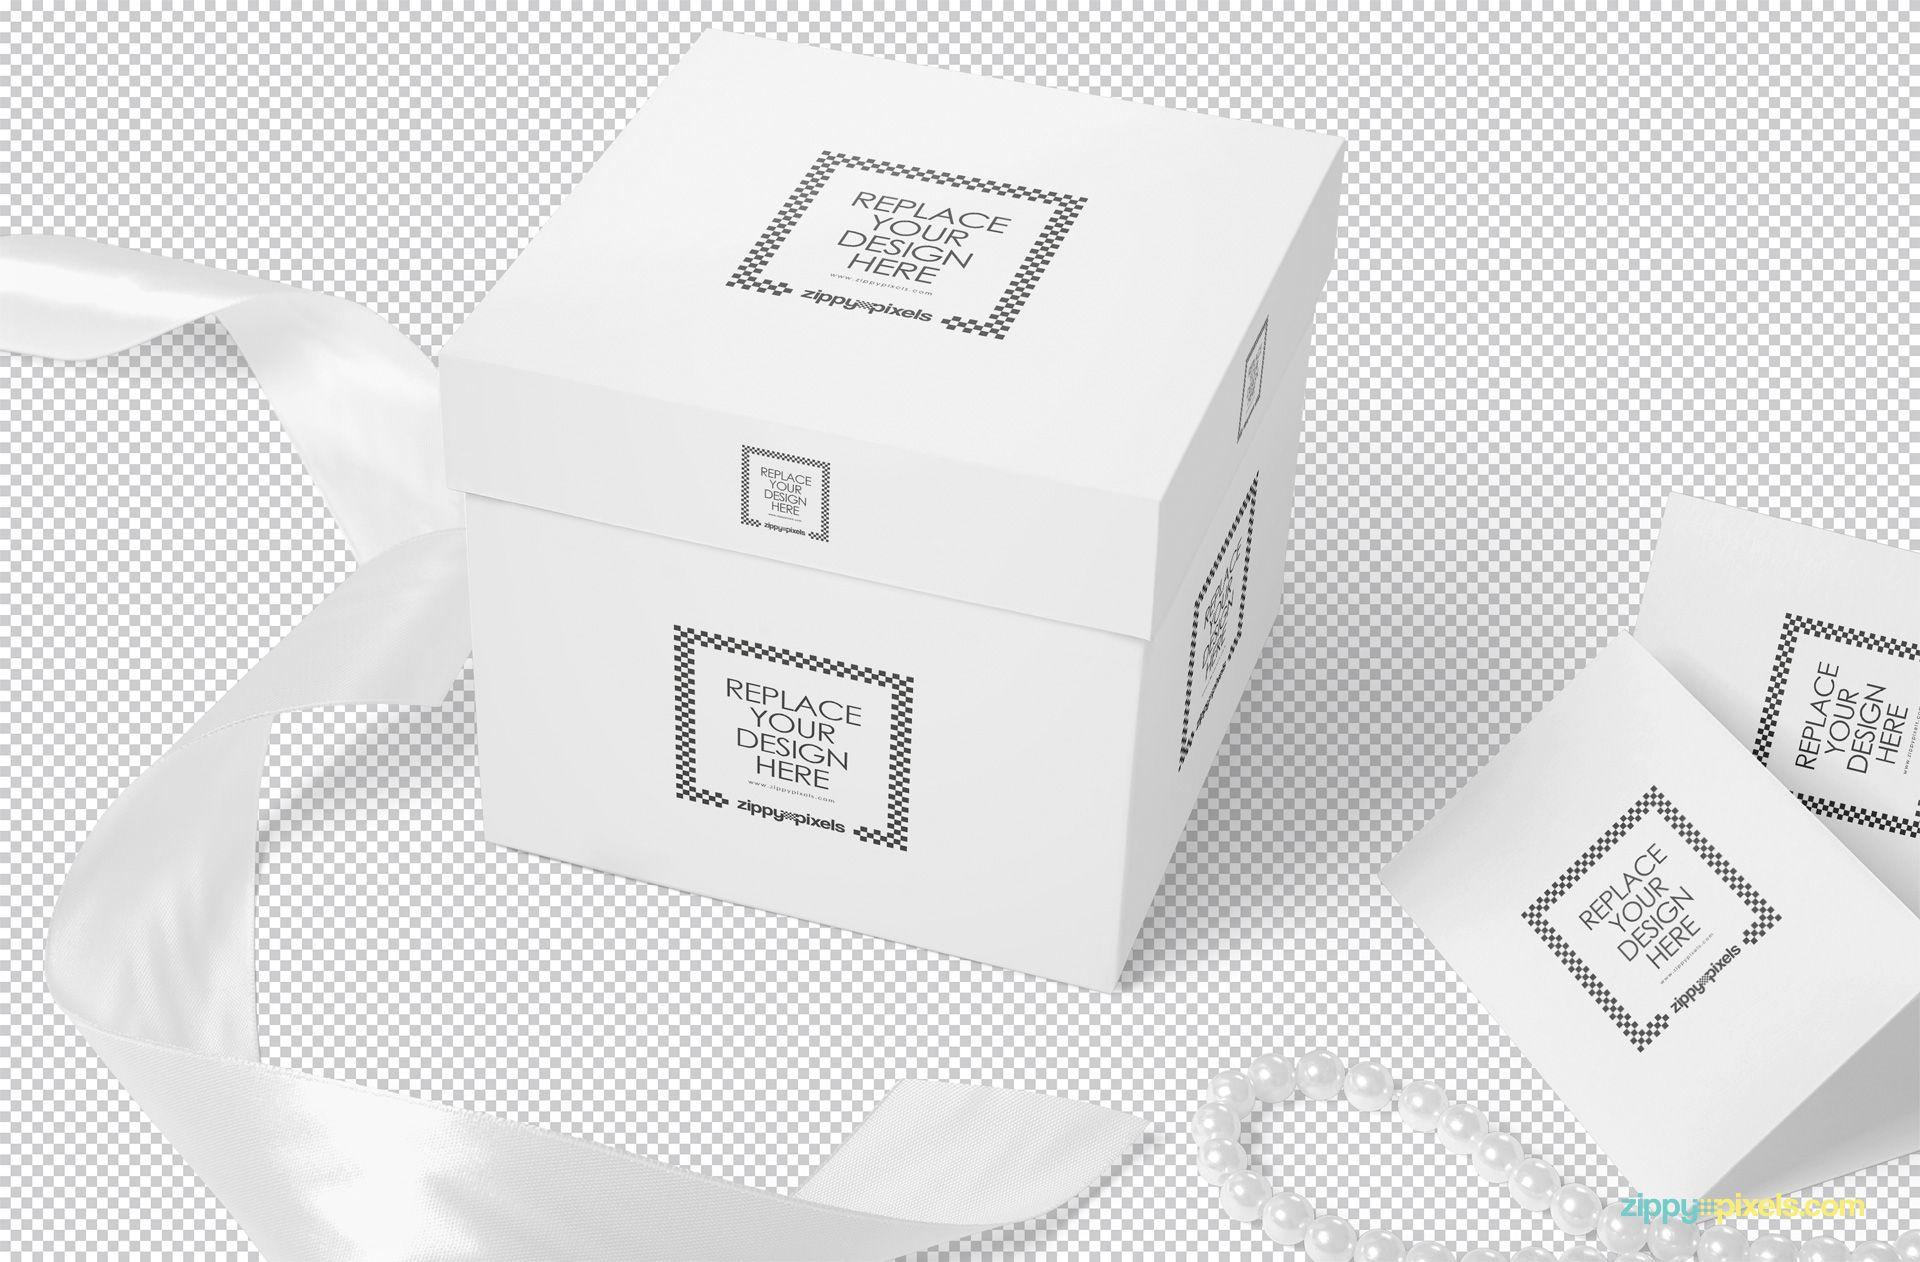 Download Free Luxury Gift Mockup Zippypixels Luxury Gift Gifts Free Gifts